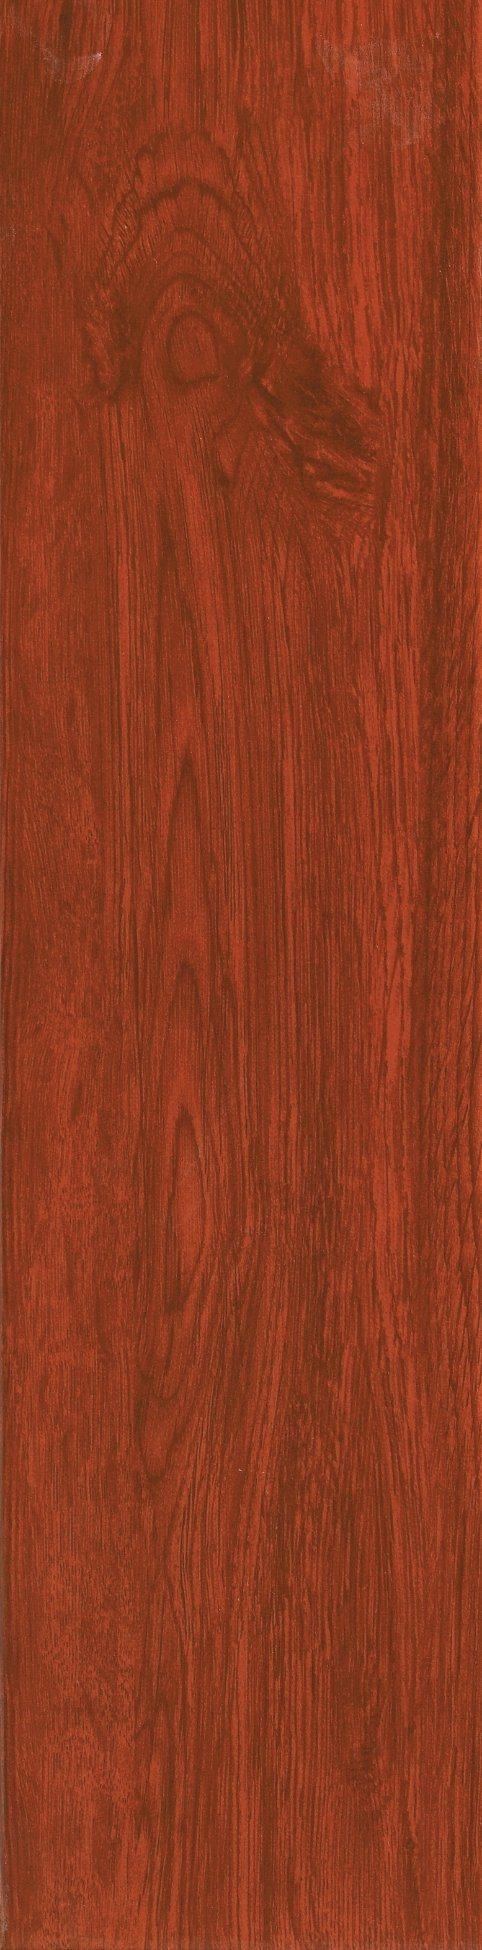 Mf615853 Hot Sale Wooden Tile Antique Floor Tile Porcelain Material